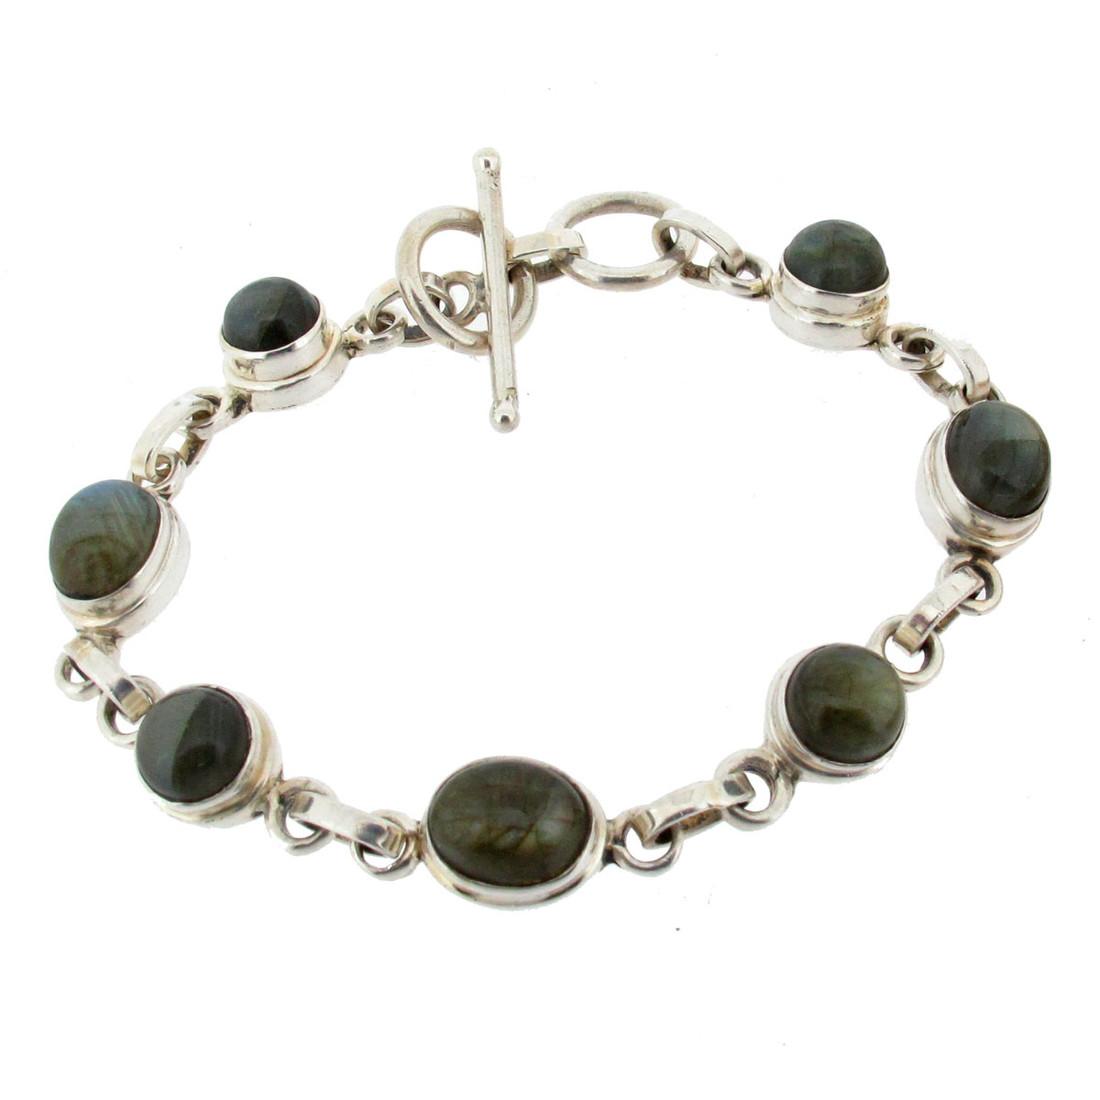 Labradorite sterling silver bracelet with toggle.